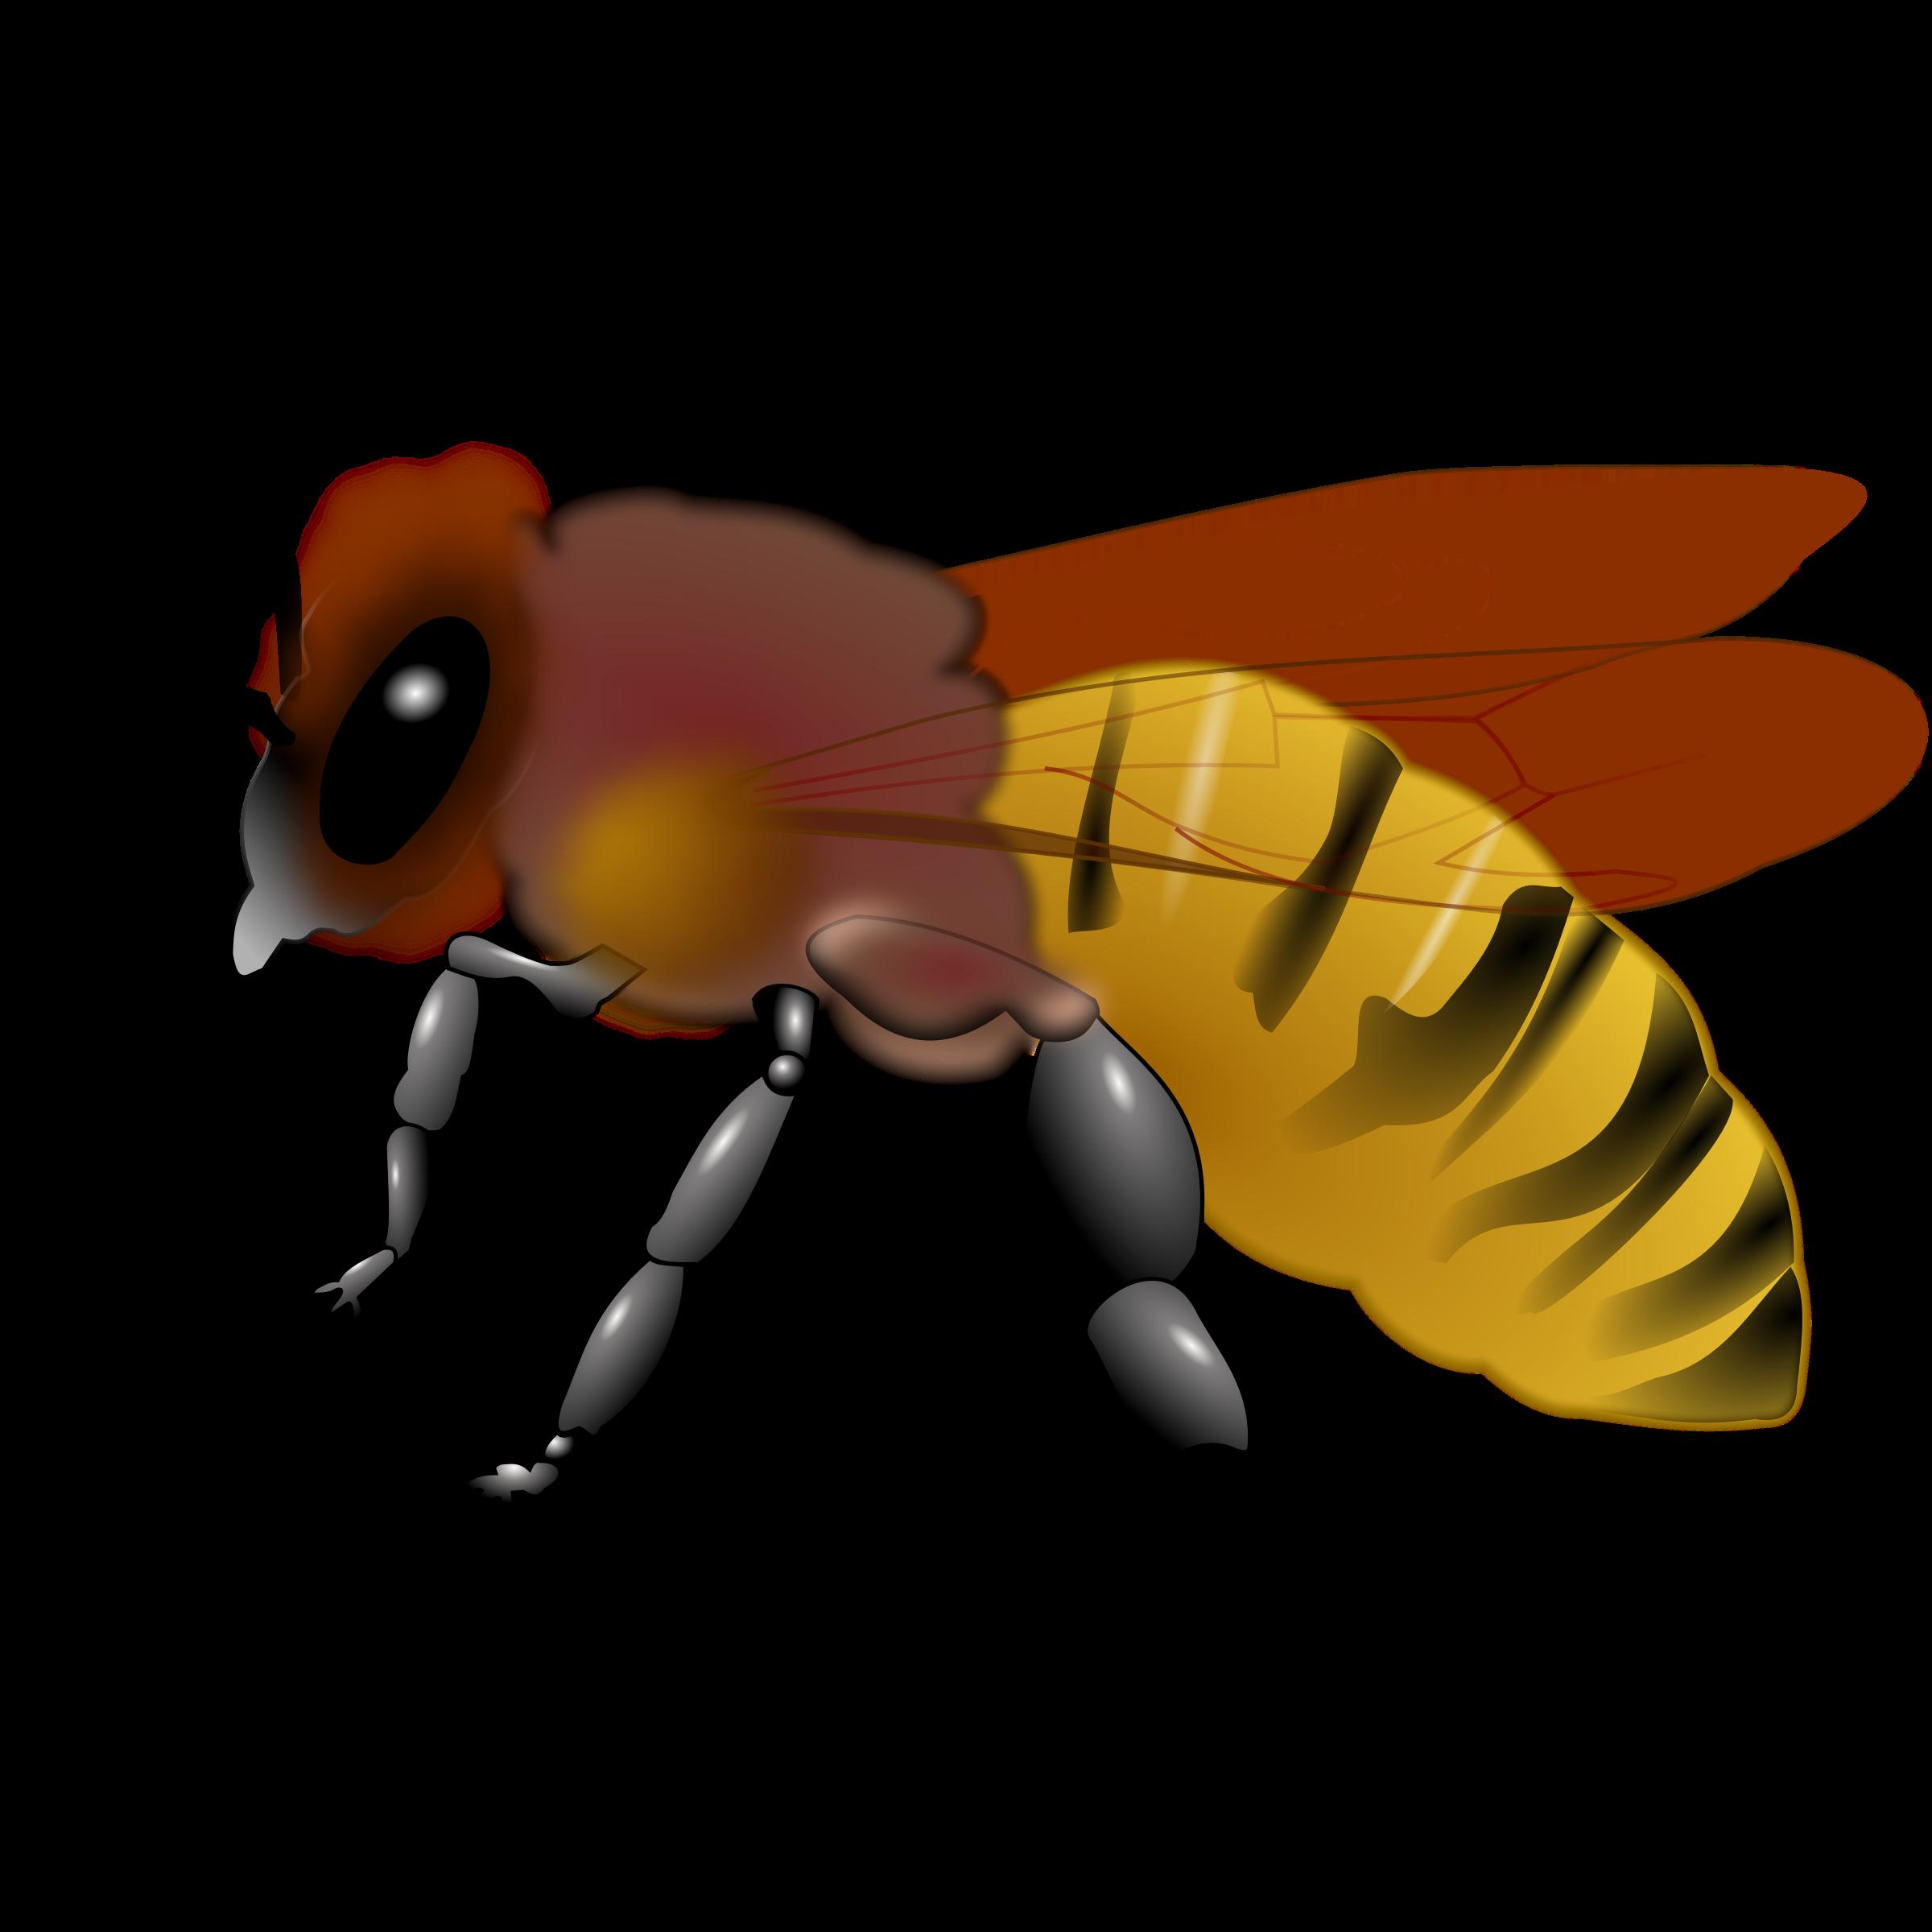 Bee Clipart : Honeybee-Bee Clipart : Honeybee-12